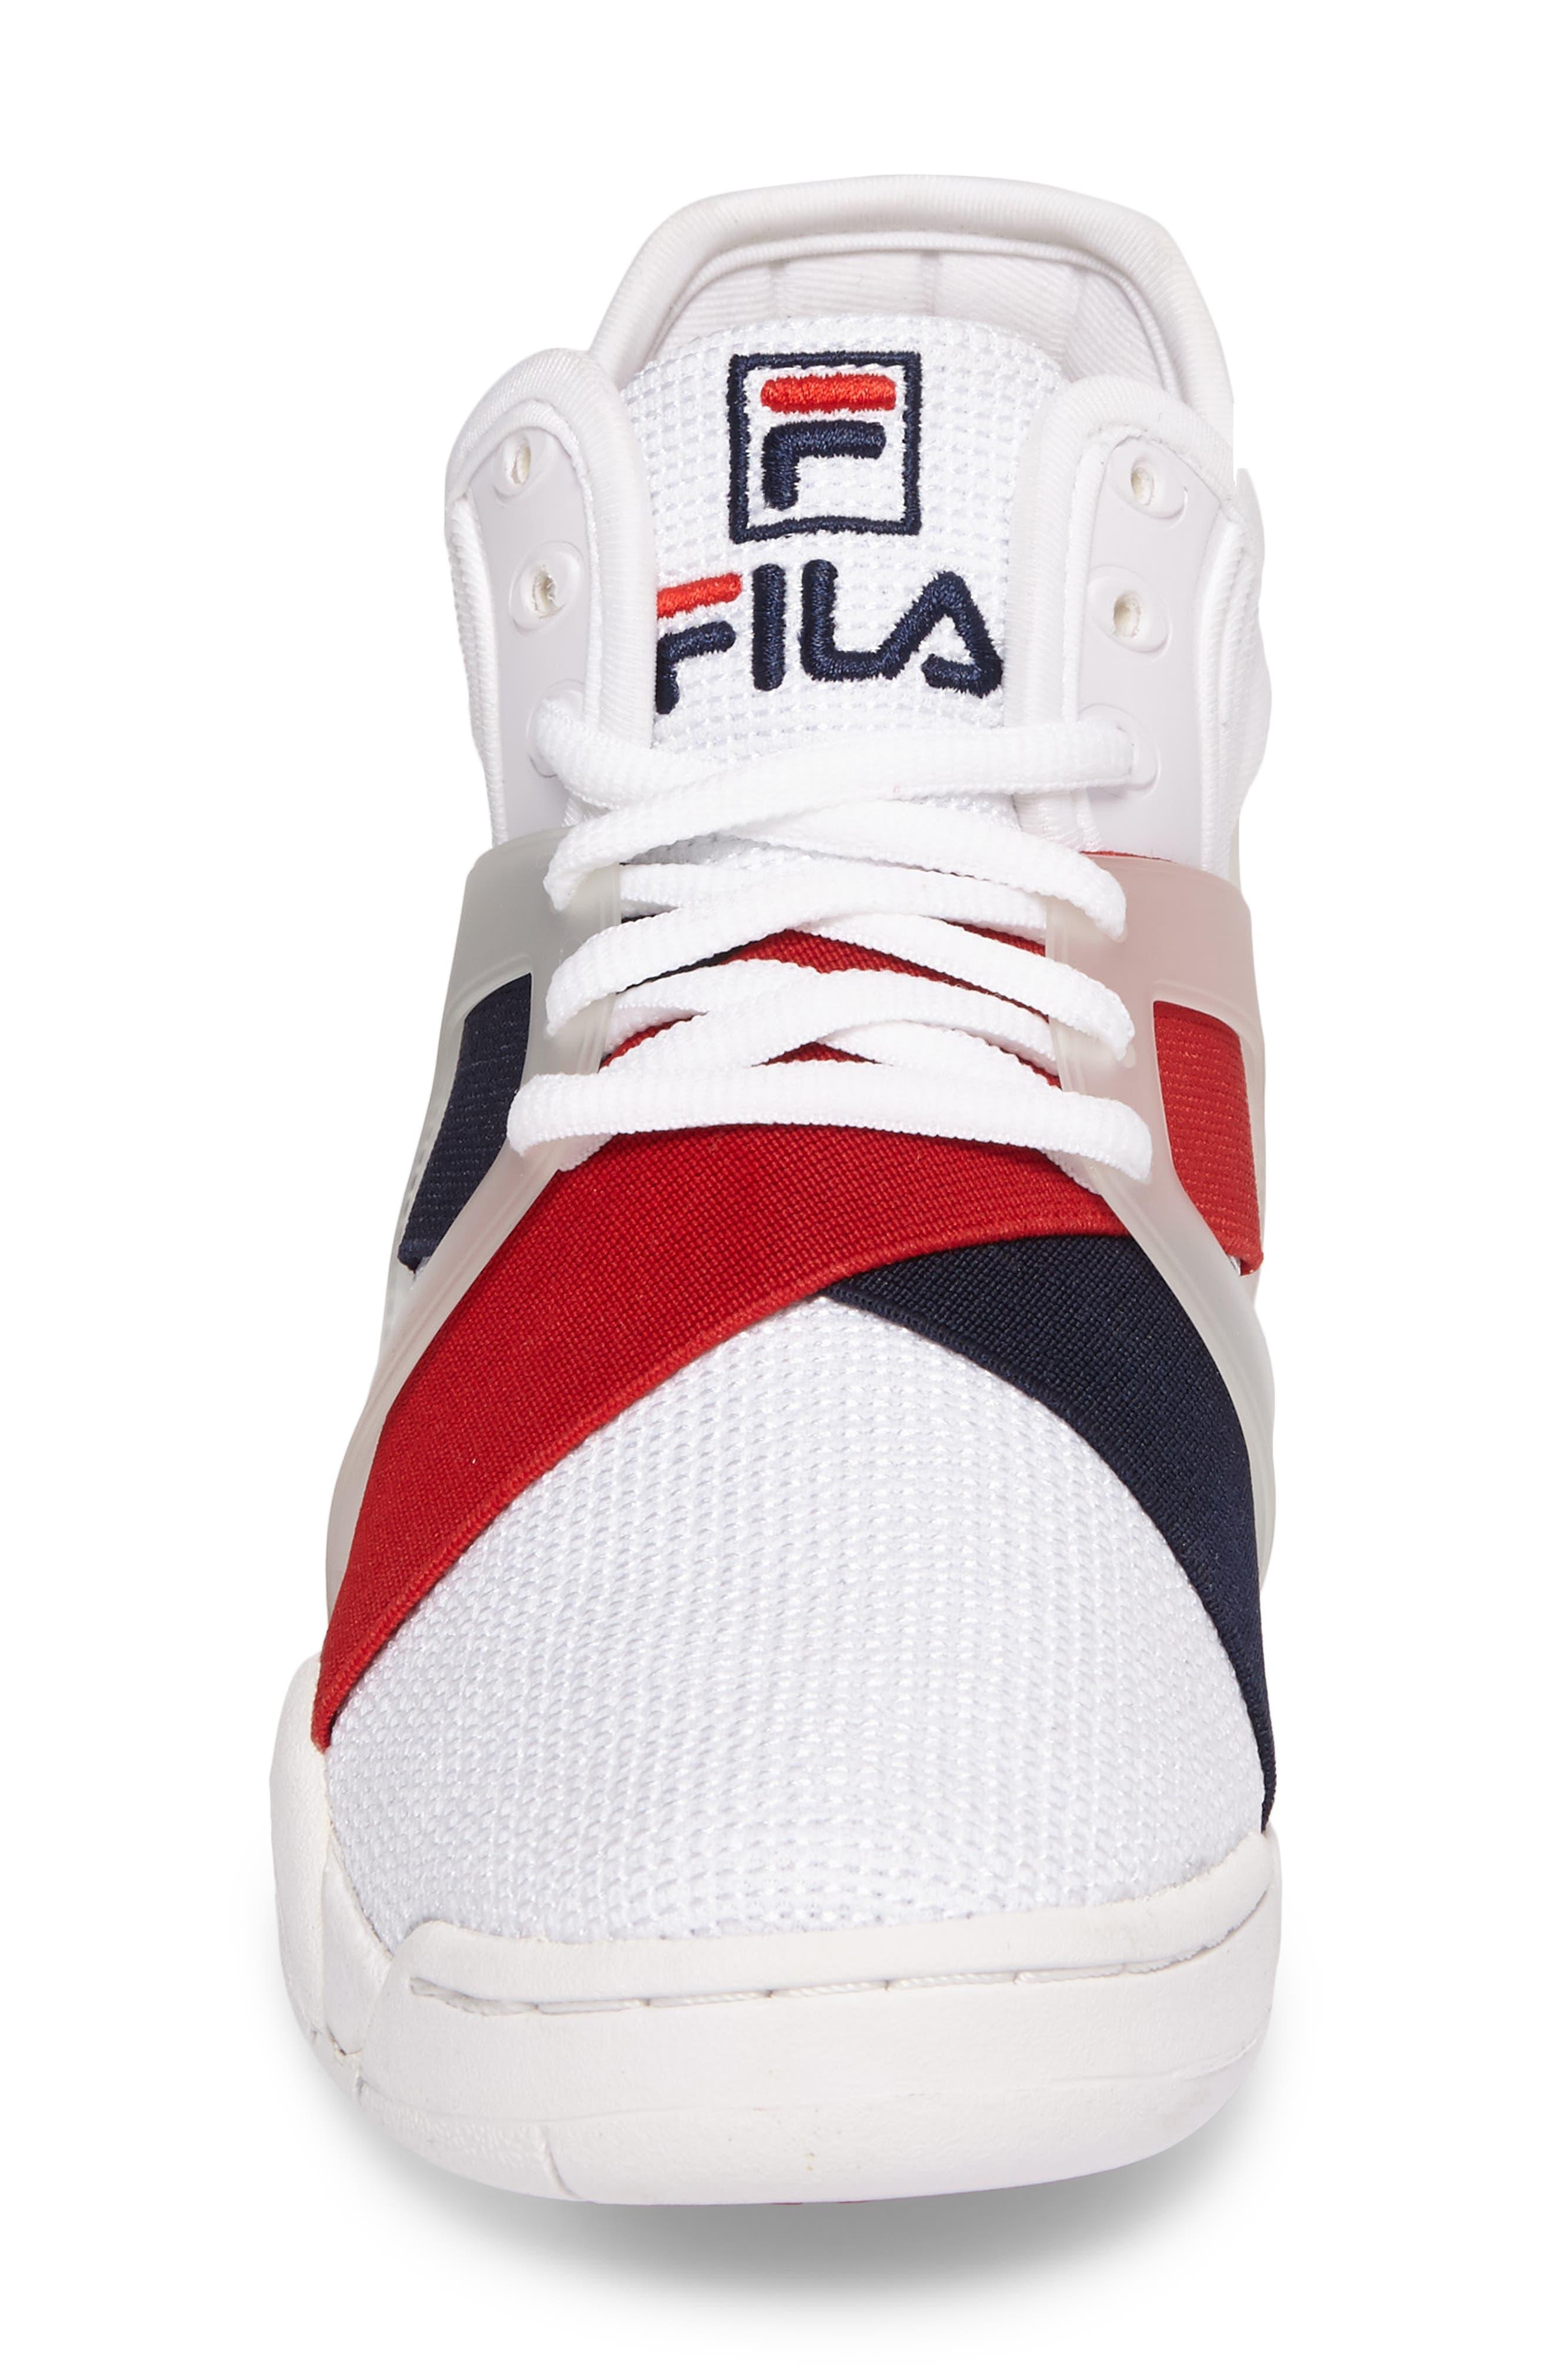 FILA, Cage 17 Logo High Top Sneaker, Alternate thumbnail 4, color, 125